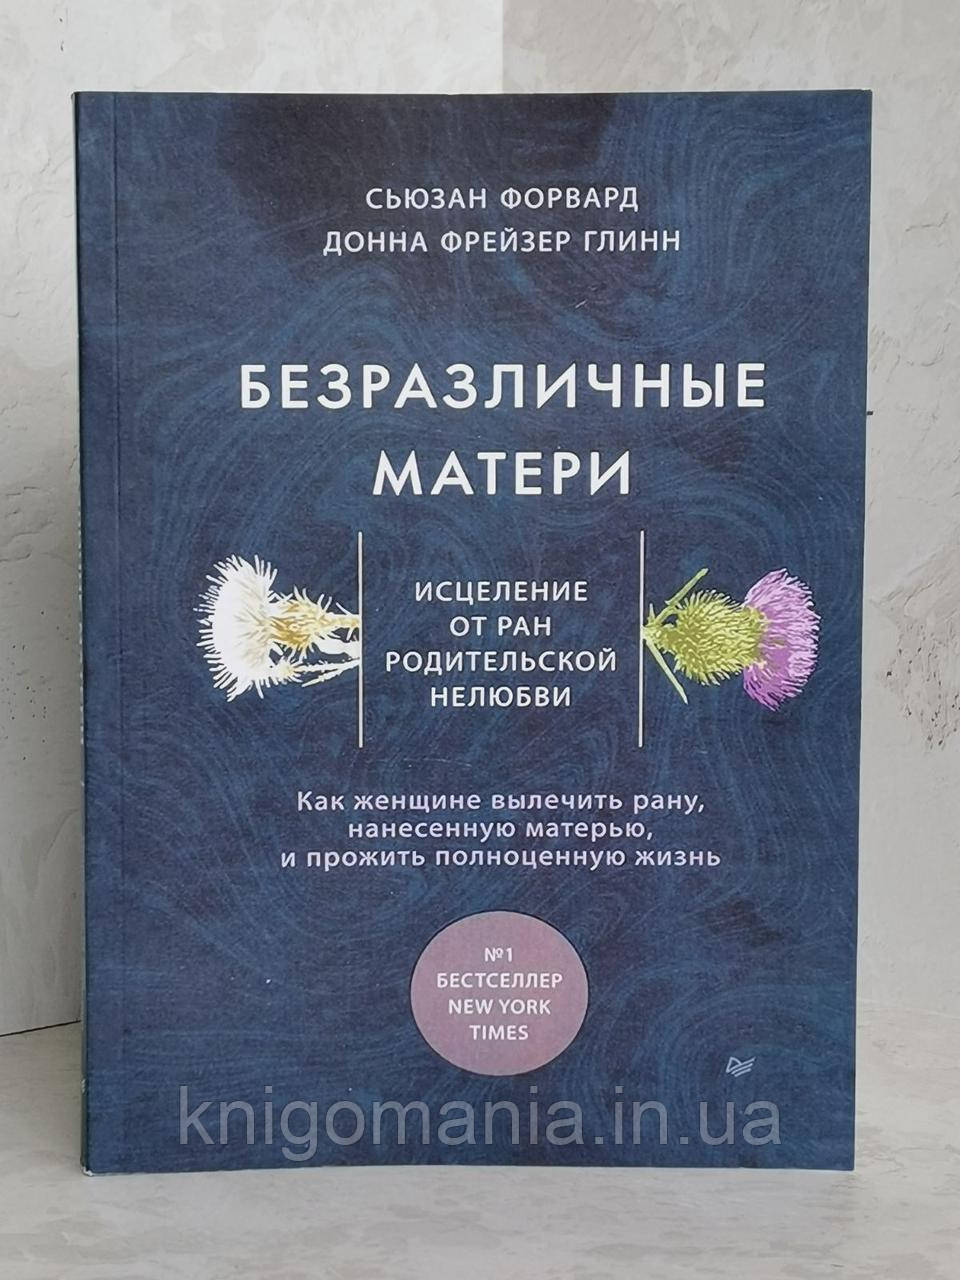 "Книга ""Безразличные матери"" Сьюзан Форвард, Донна Фрейзер Глинн"